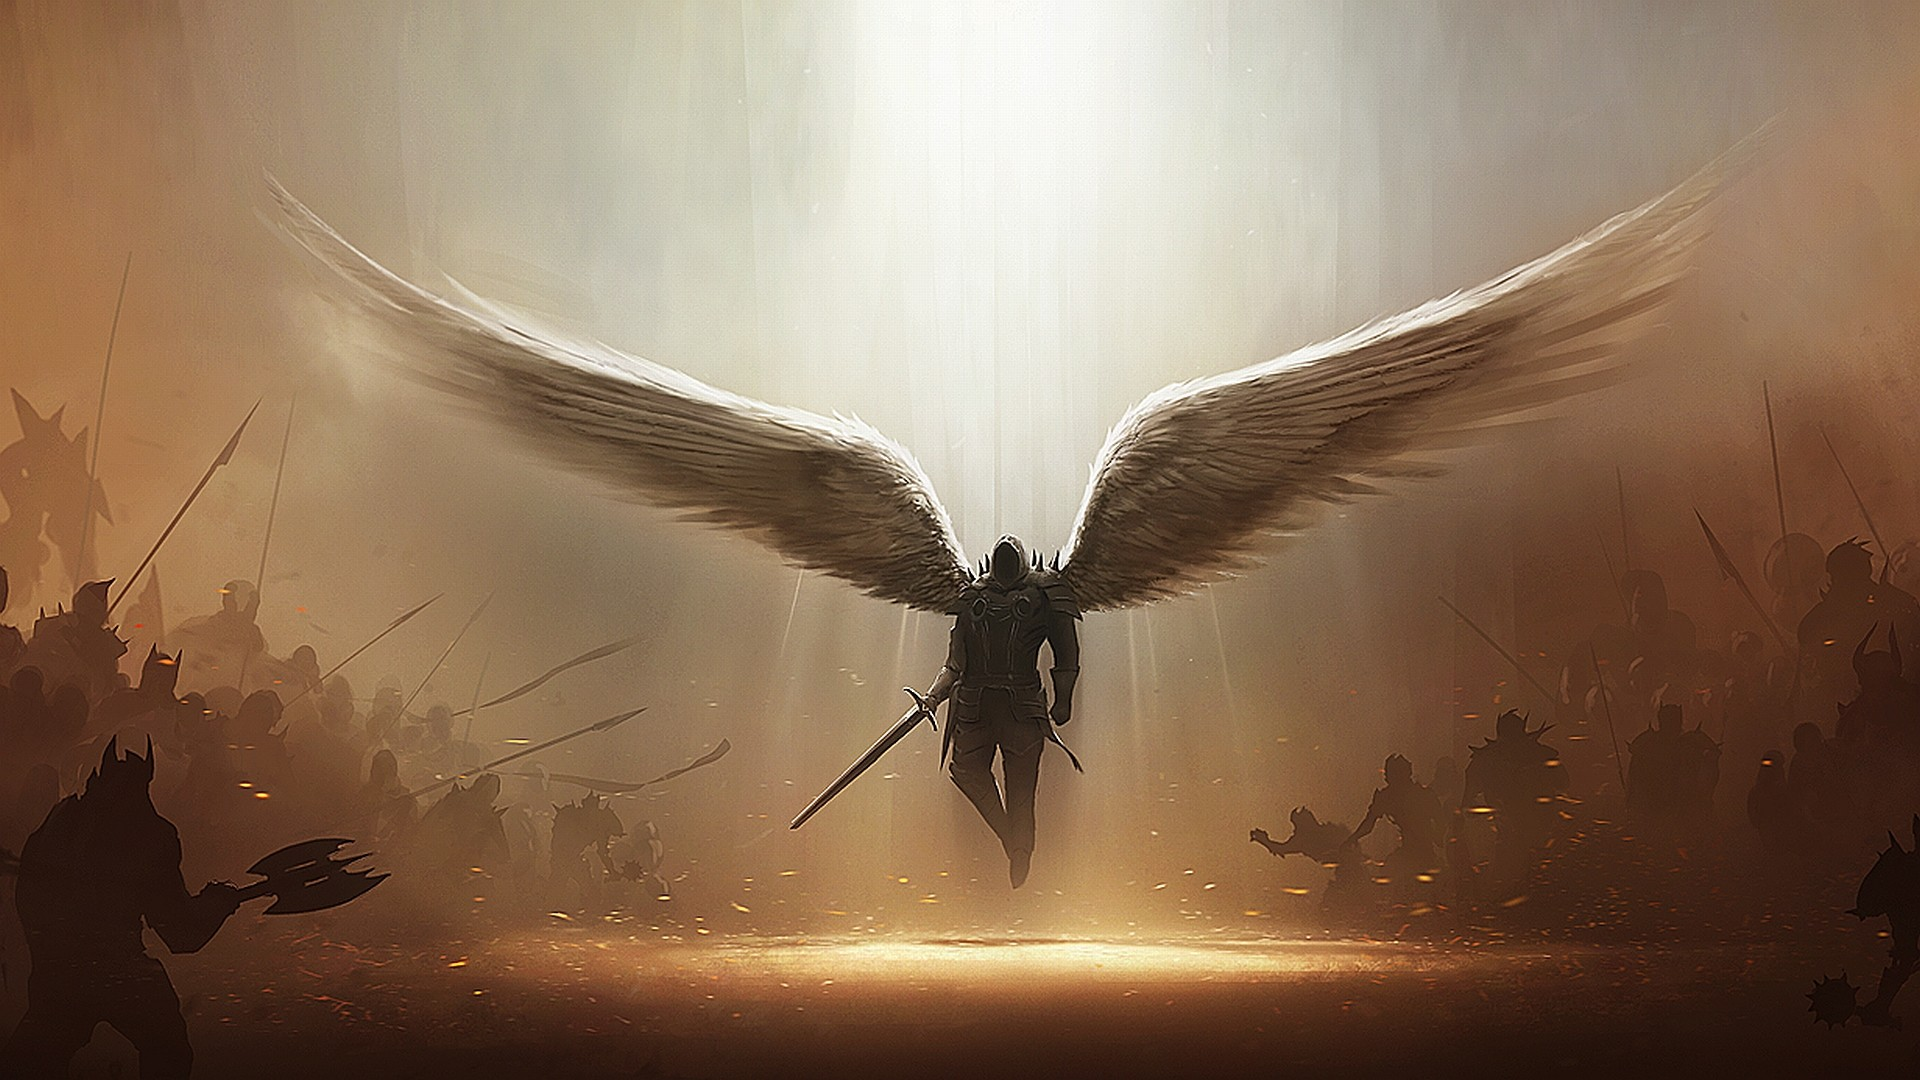 angels wings war original HD Wallpaper angels wings war original 1920x1080